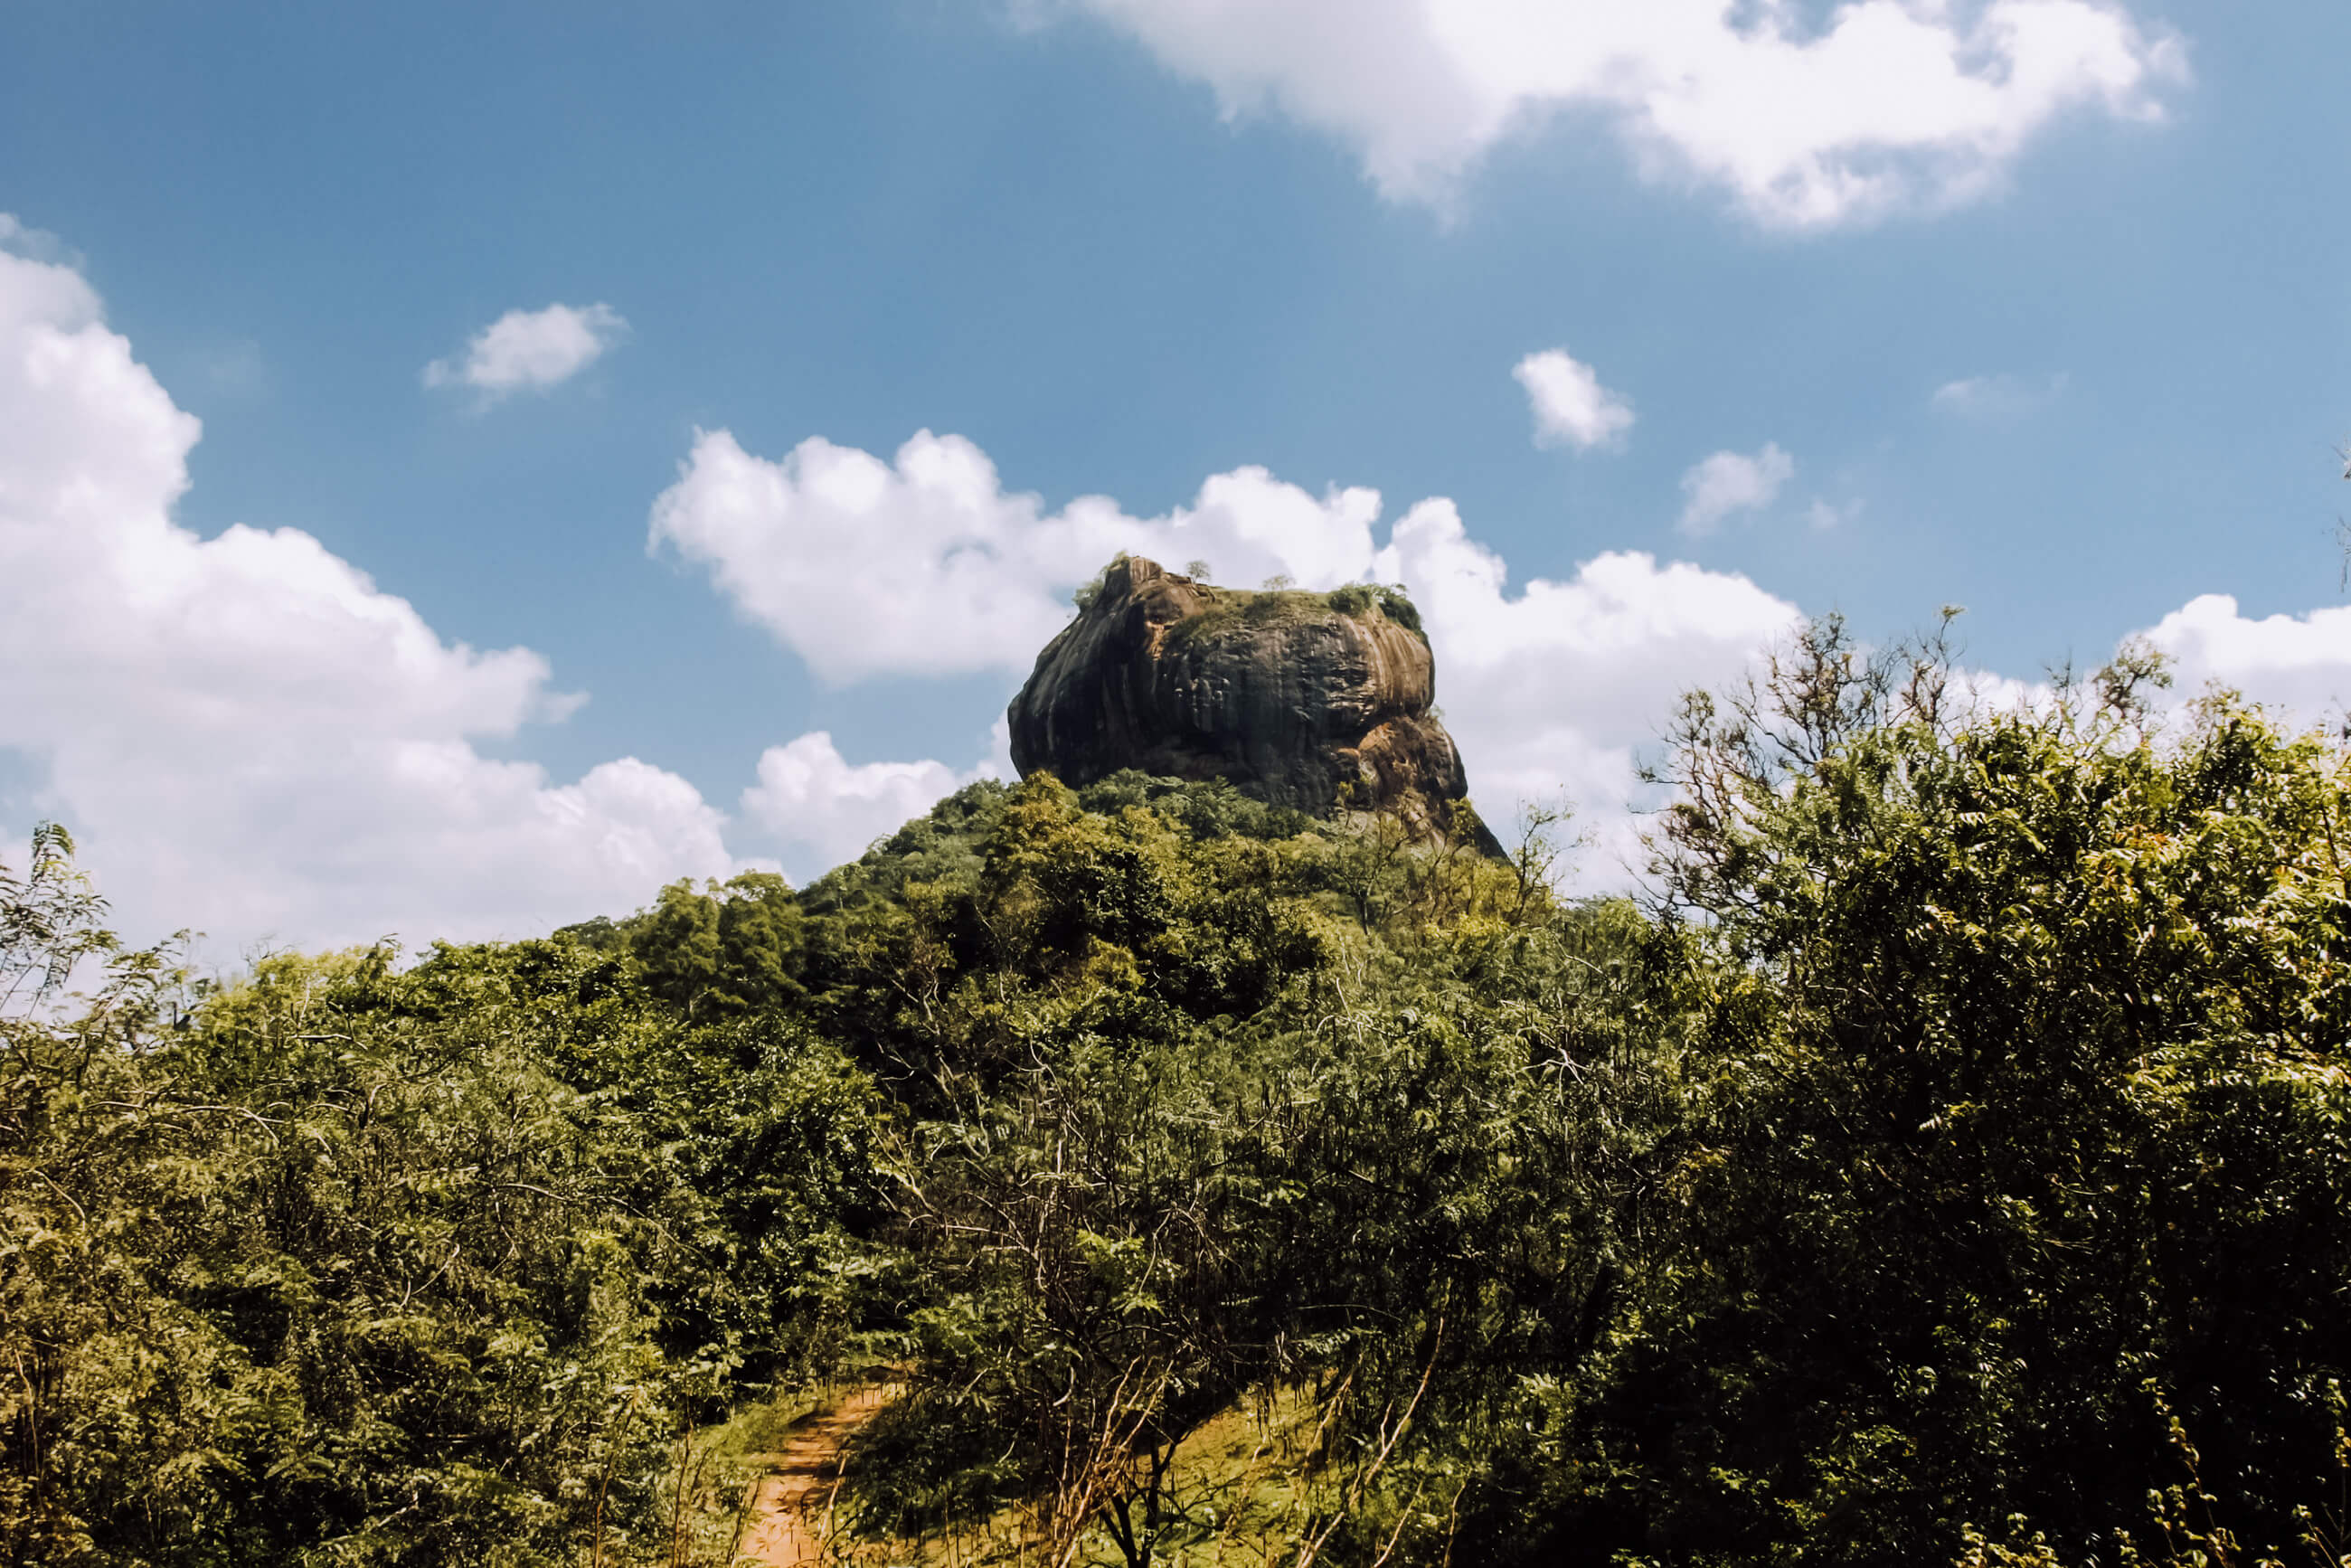 https://bubo.sk/uploads/galleries/7521/archiv_srilanka_099.jpg